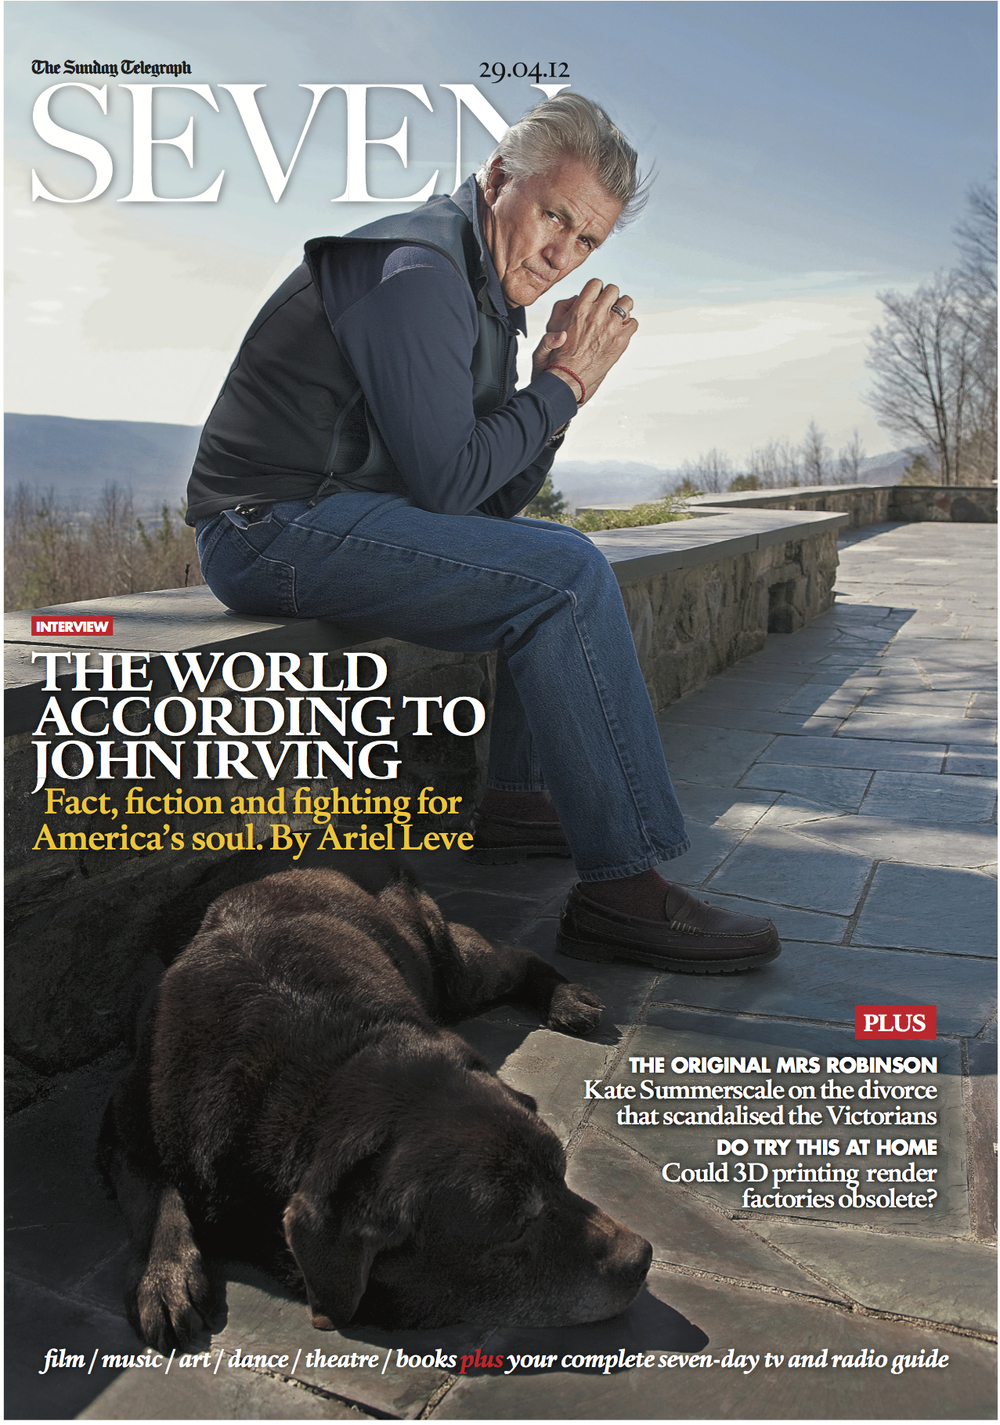 Sunday Magazine photo Blake Fitch of John Irving cover.jpg